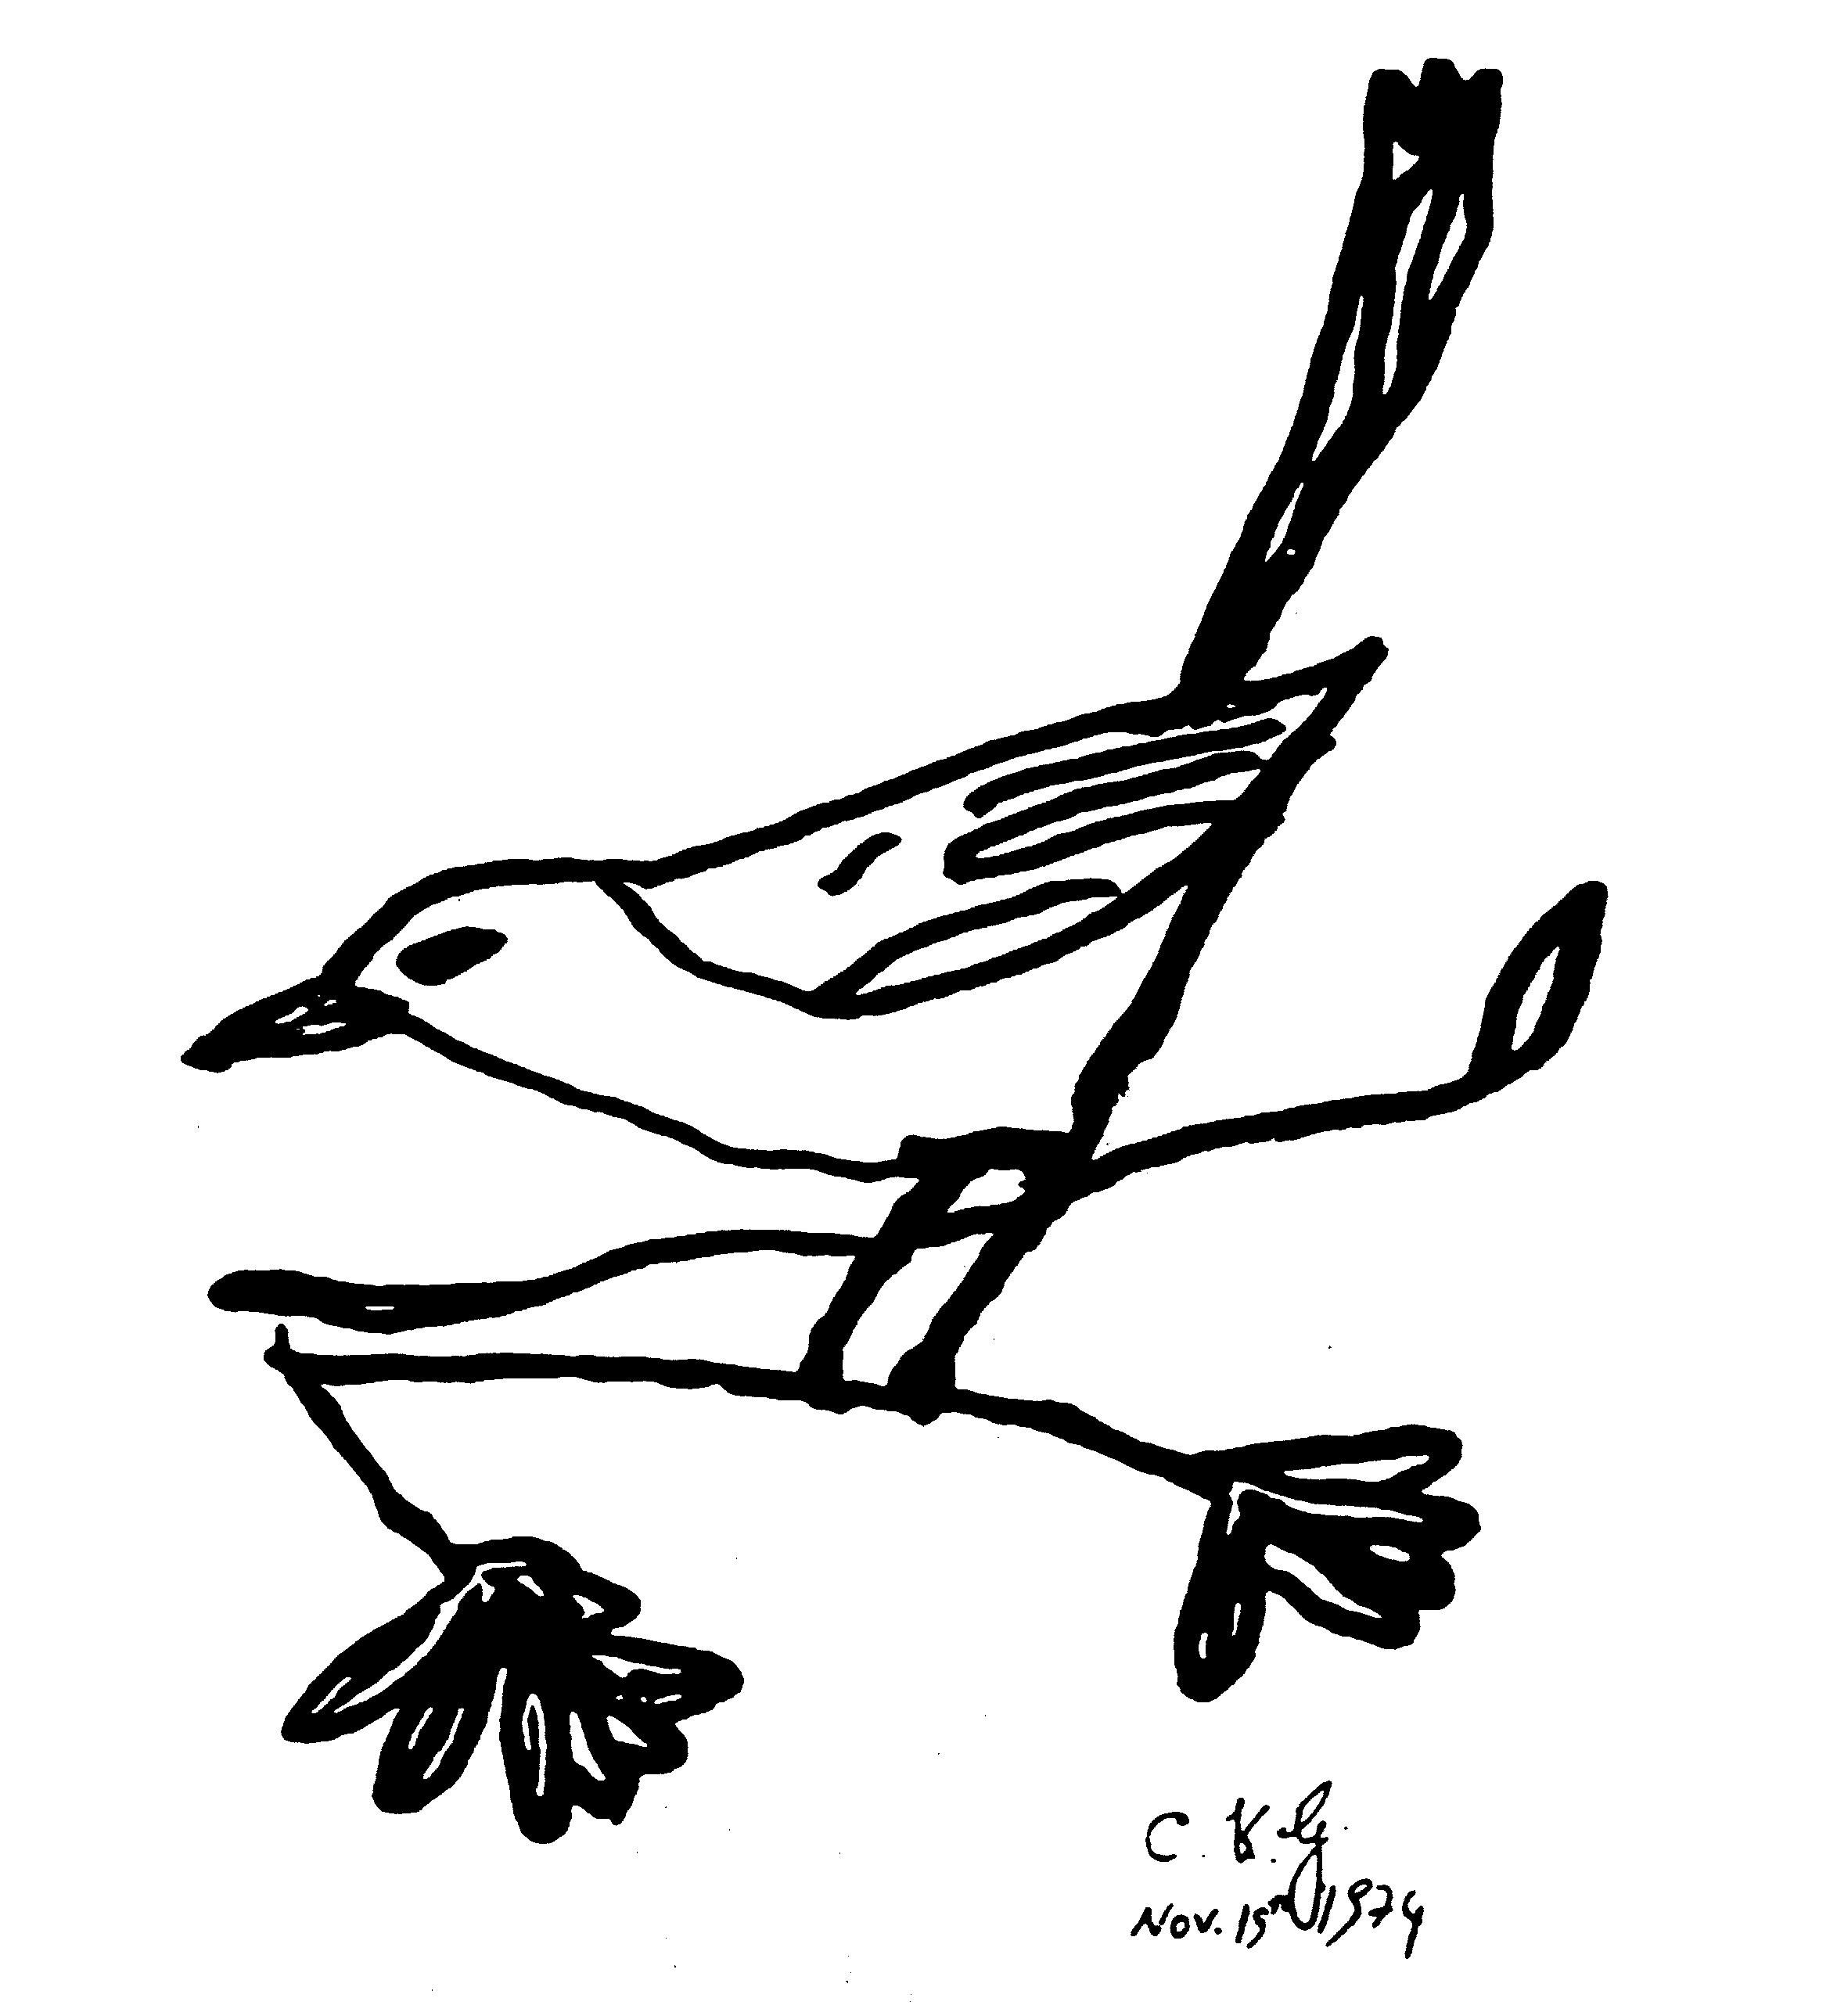 19-11-1974-ckg-bird